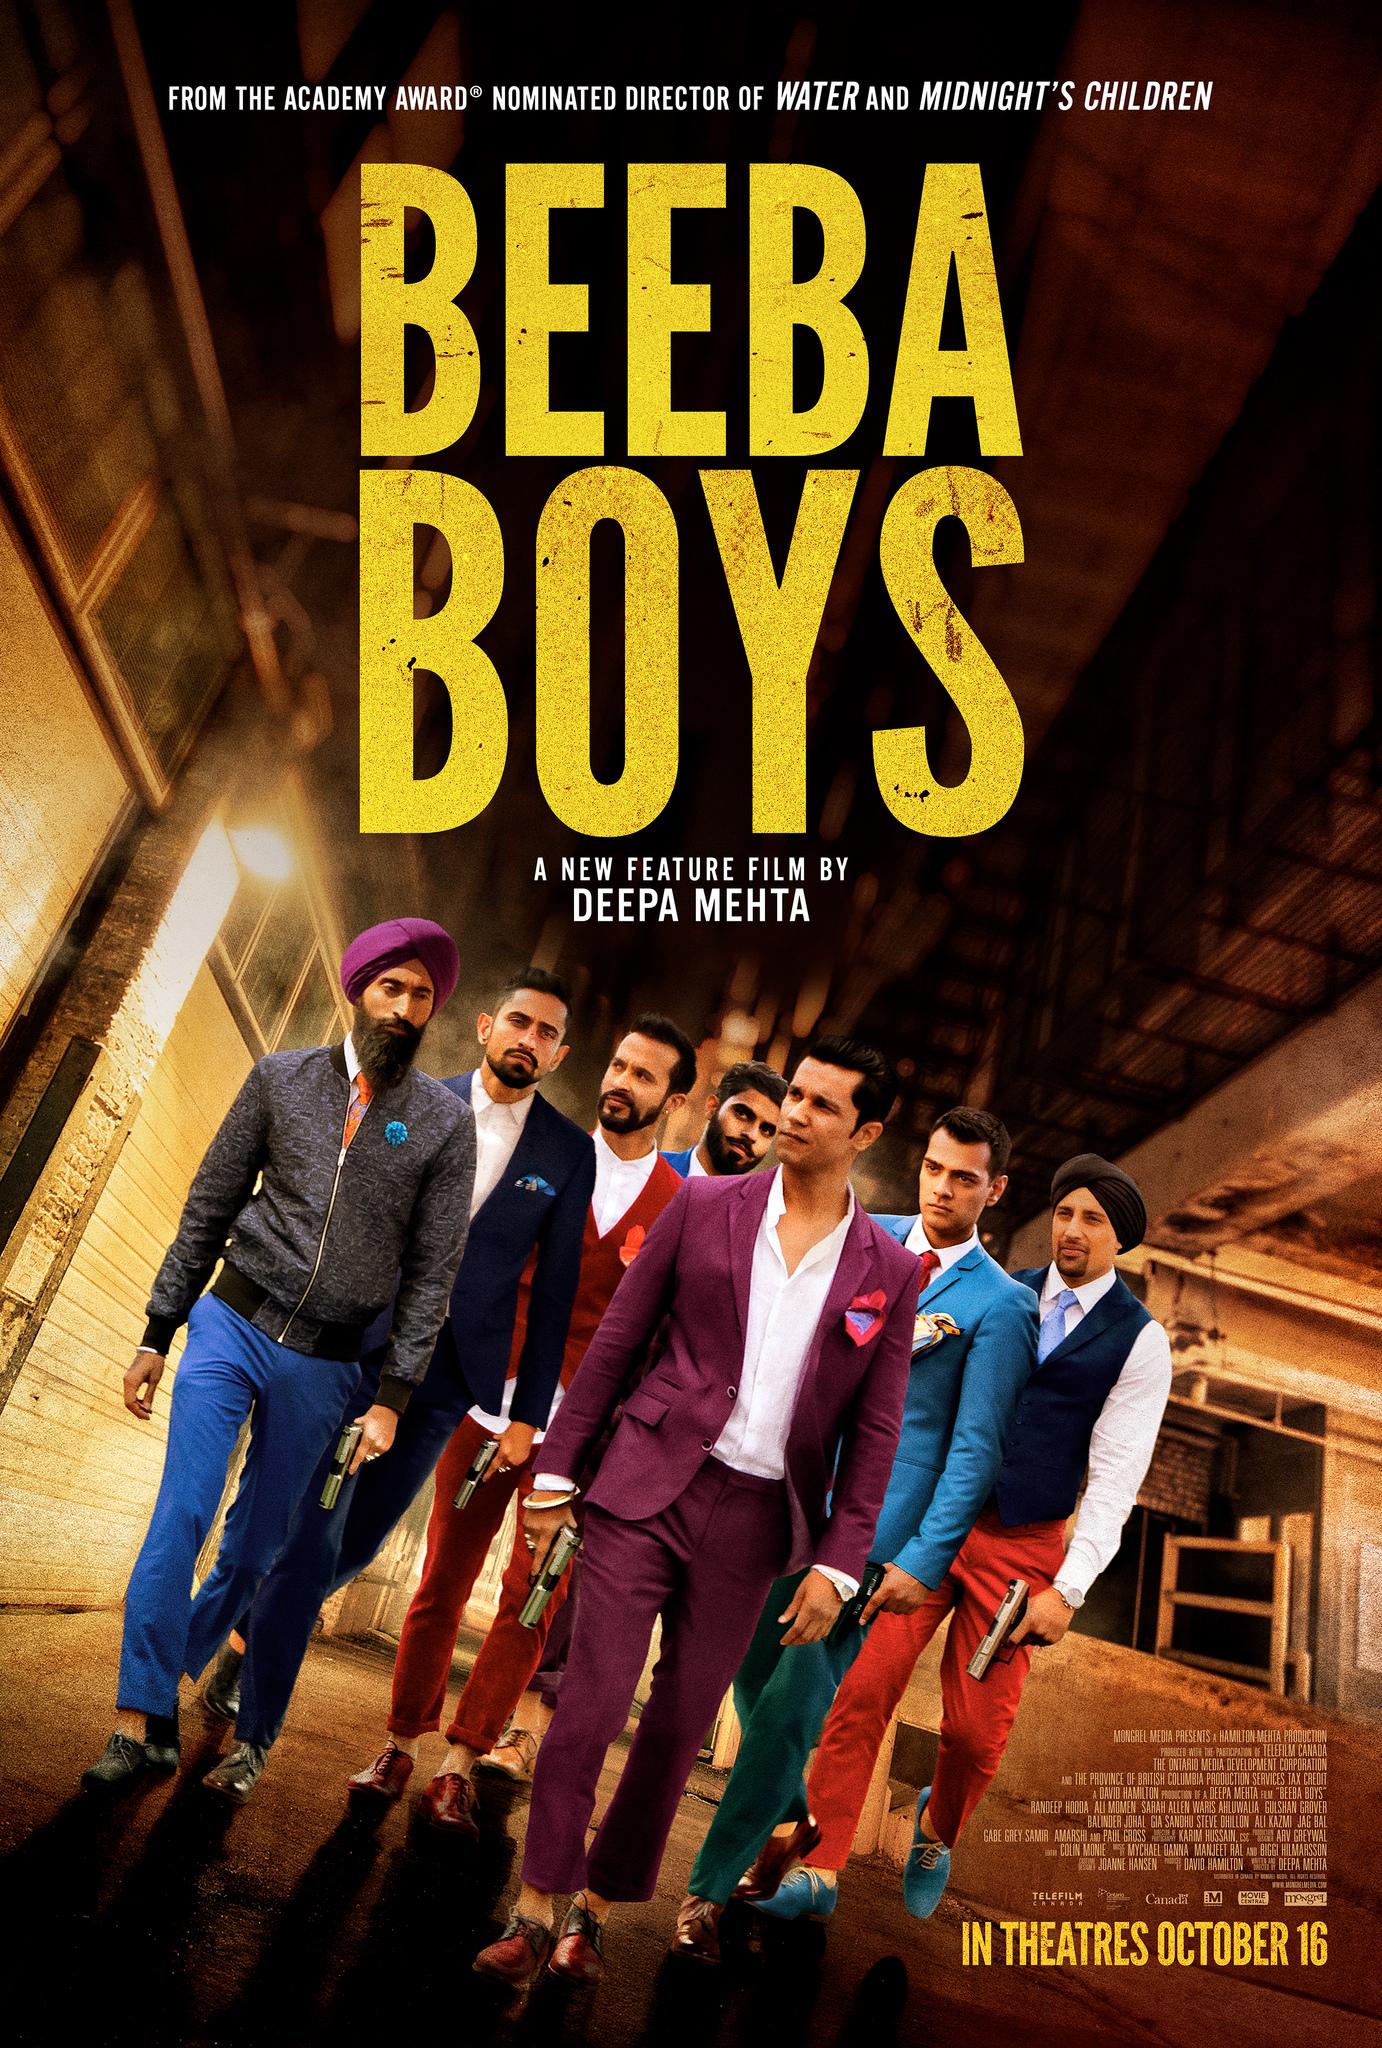 Beeba boys 2015 imdb ccuart Images